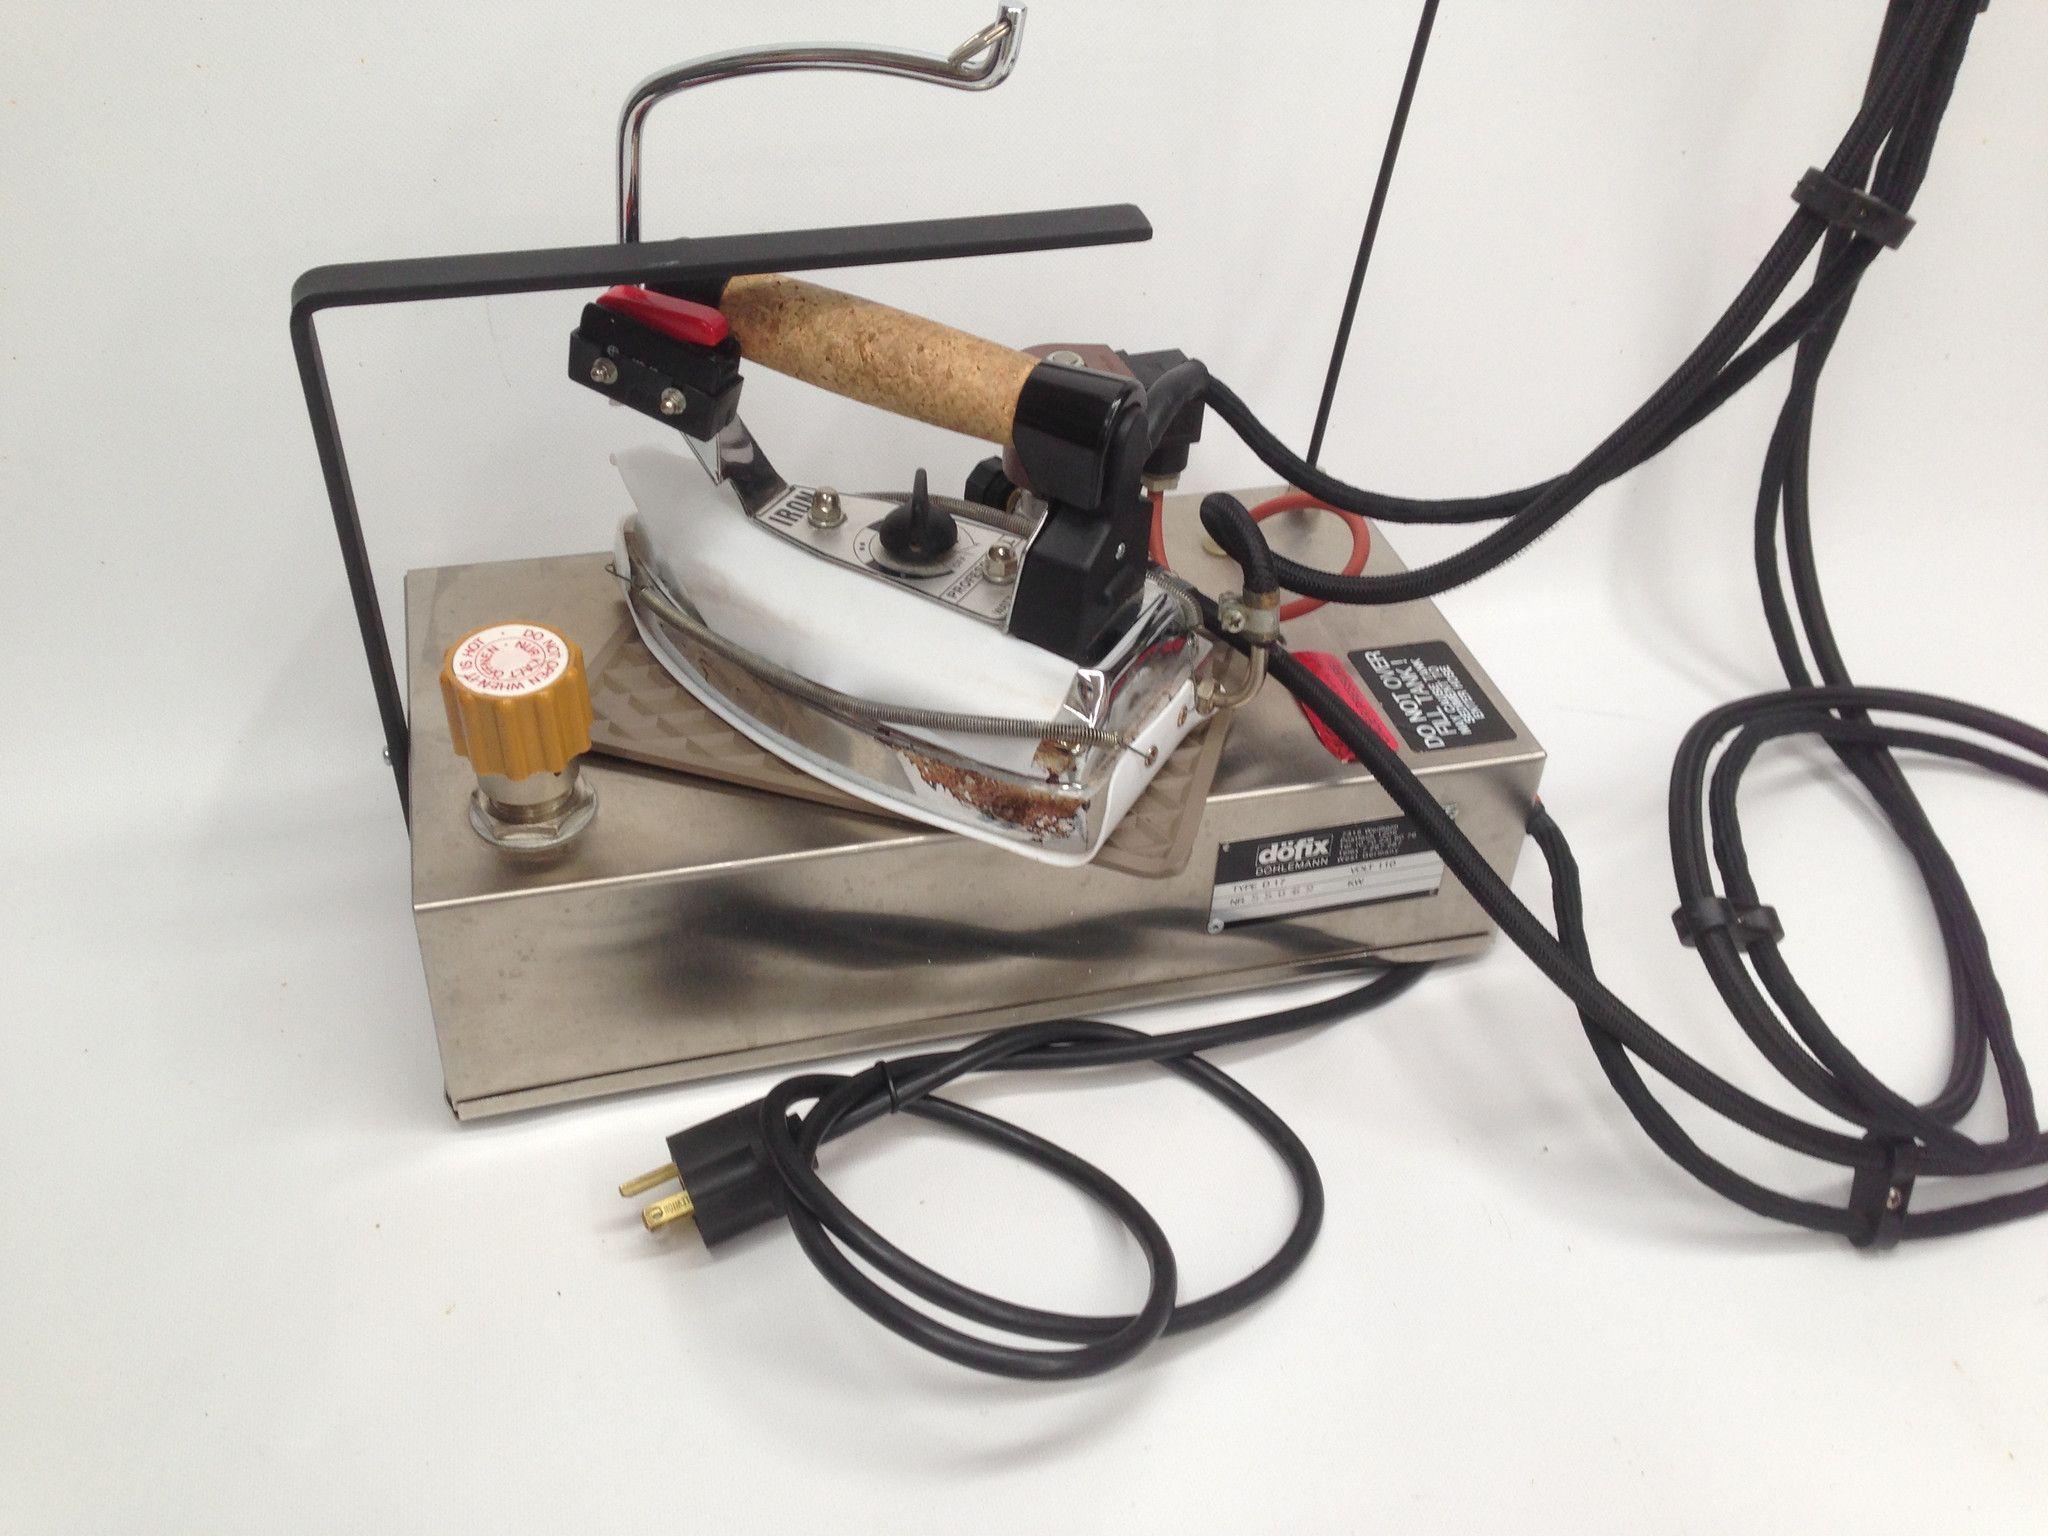 Dofix Boiler Iron Model D17 Products Pinterest